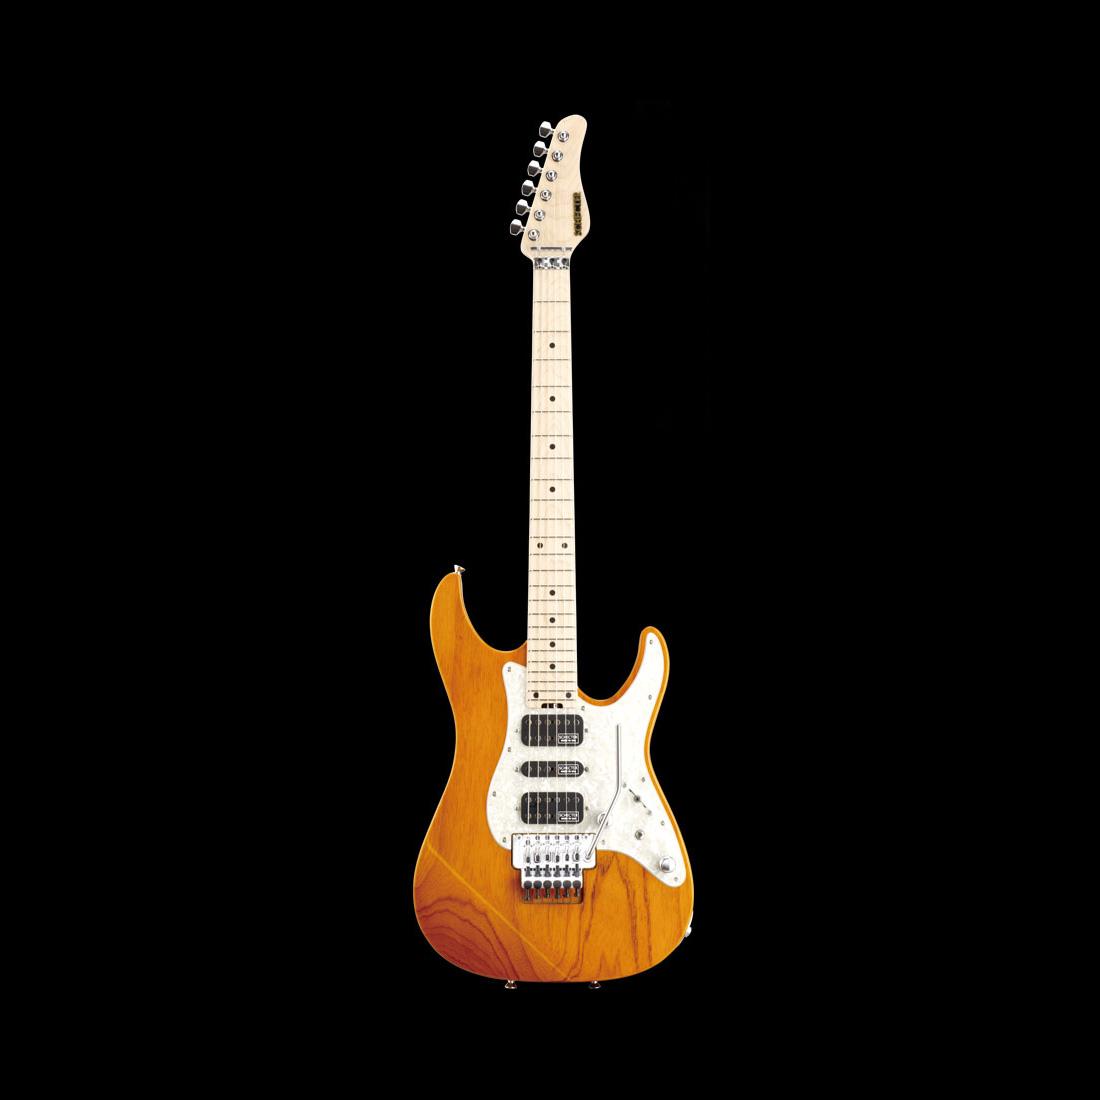 Schecter / EX-V-24-STD-FRT Maple Amber シェクター エレキギター 《受注生産:予約受付中》